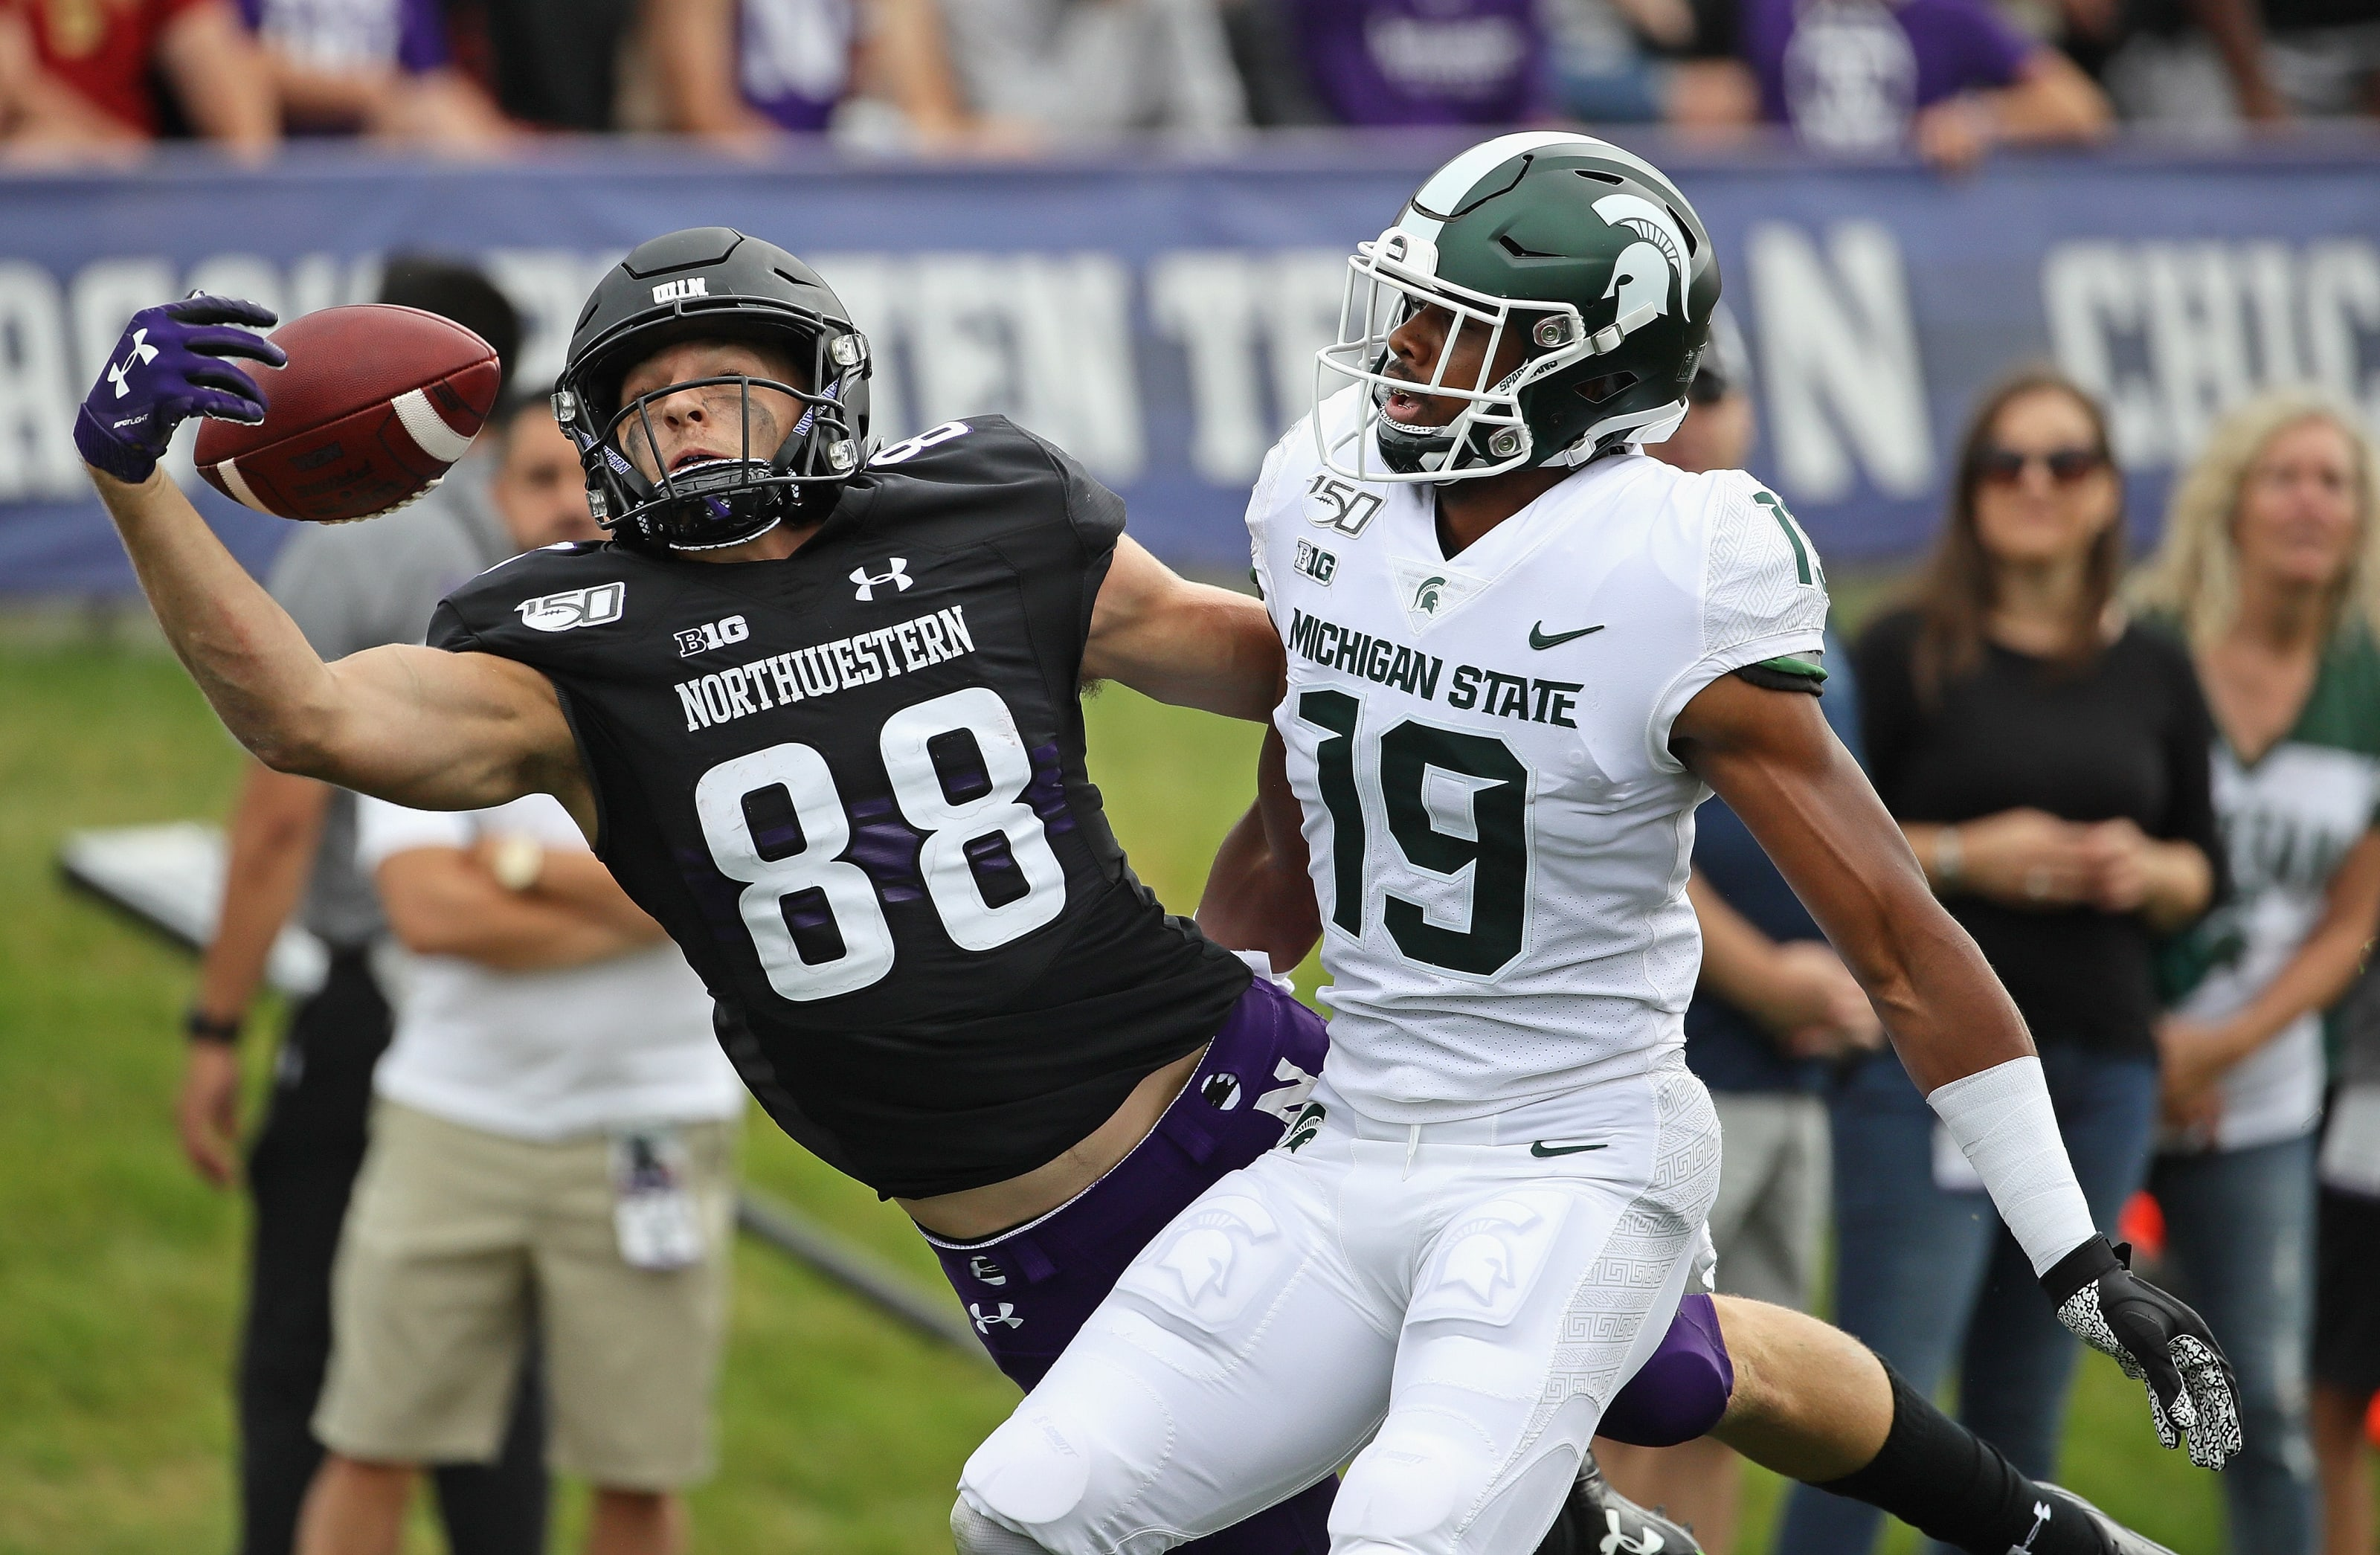 Michigan State football: 3 takeaways from big win at Northwestern in Week 4